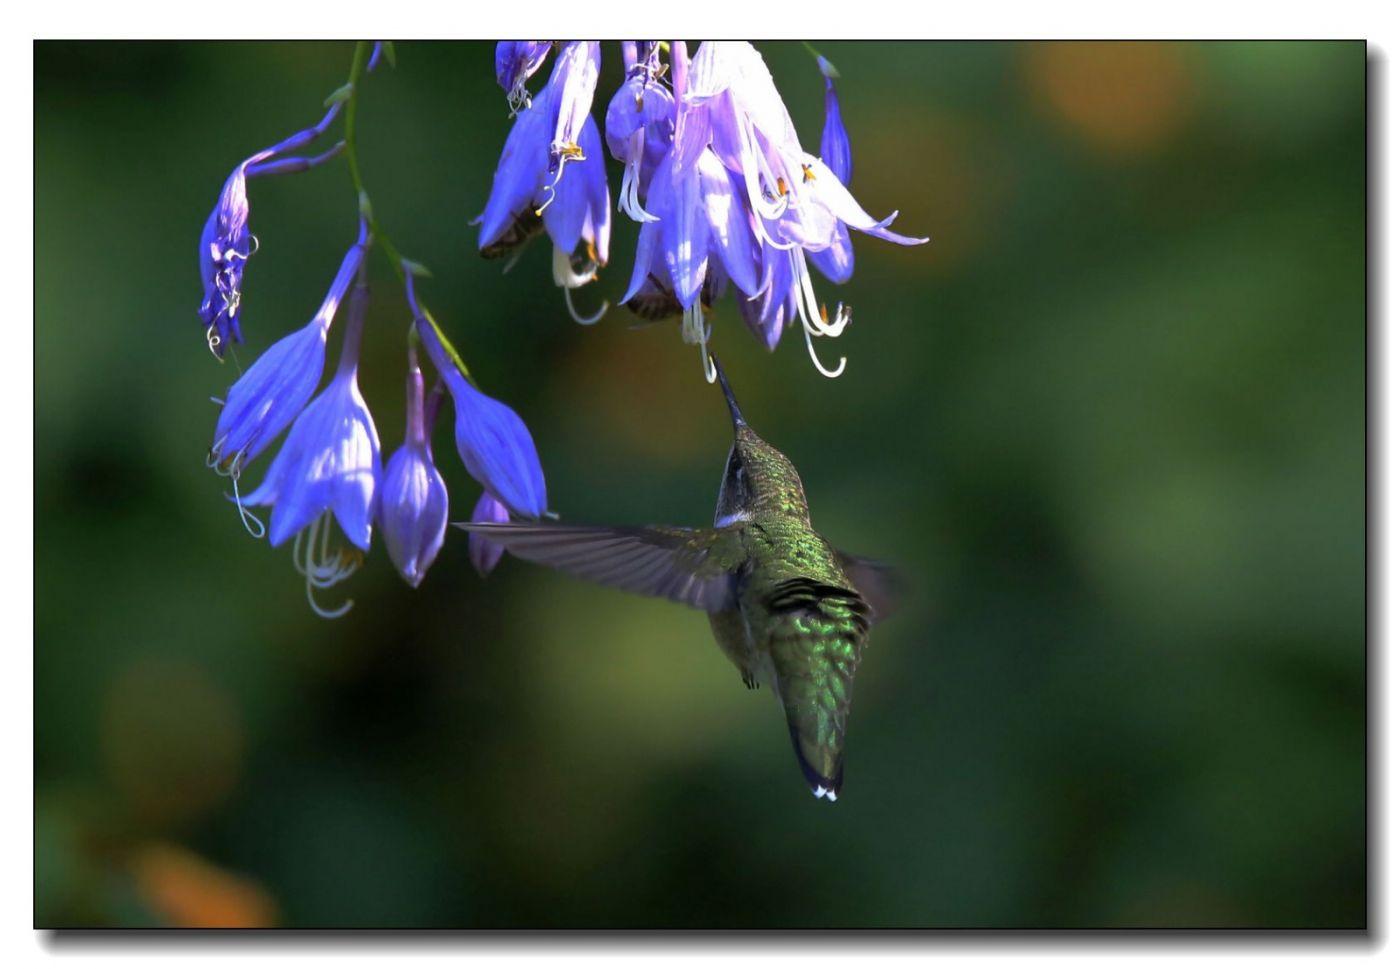 蜂鸟组图(六)_图1-6